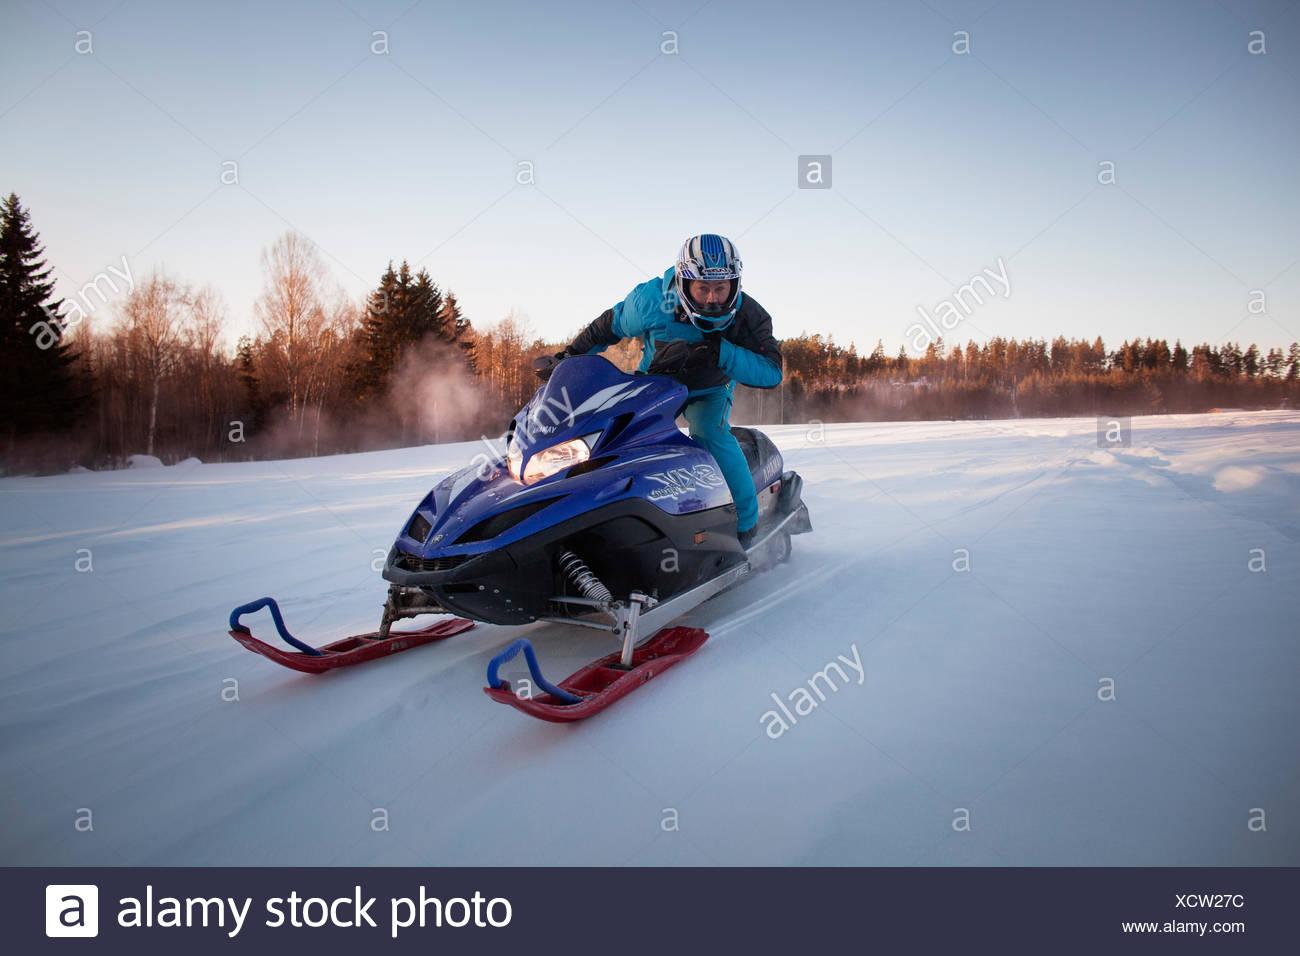 Sweden, Halsingland, Man driving snowmobile - Stock Image